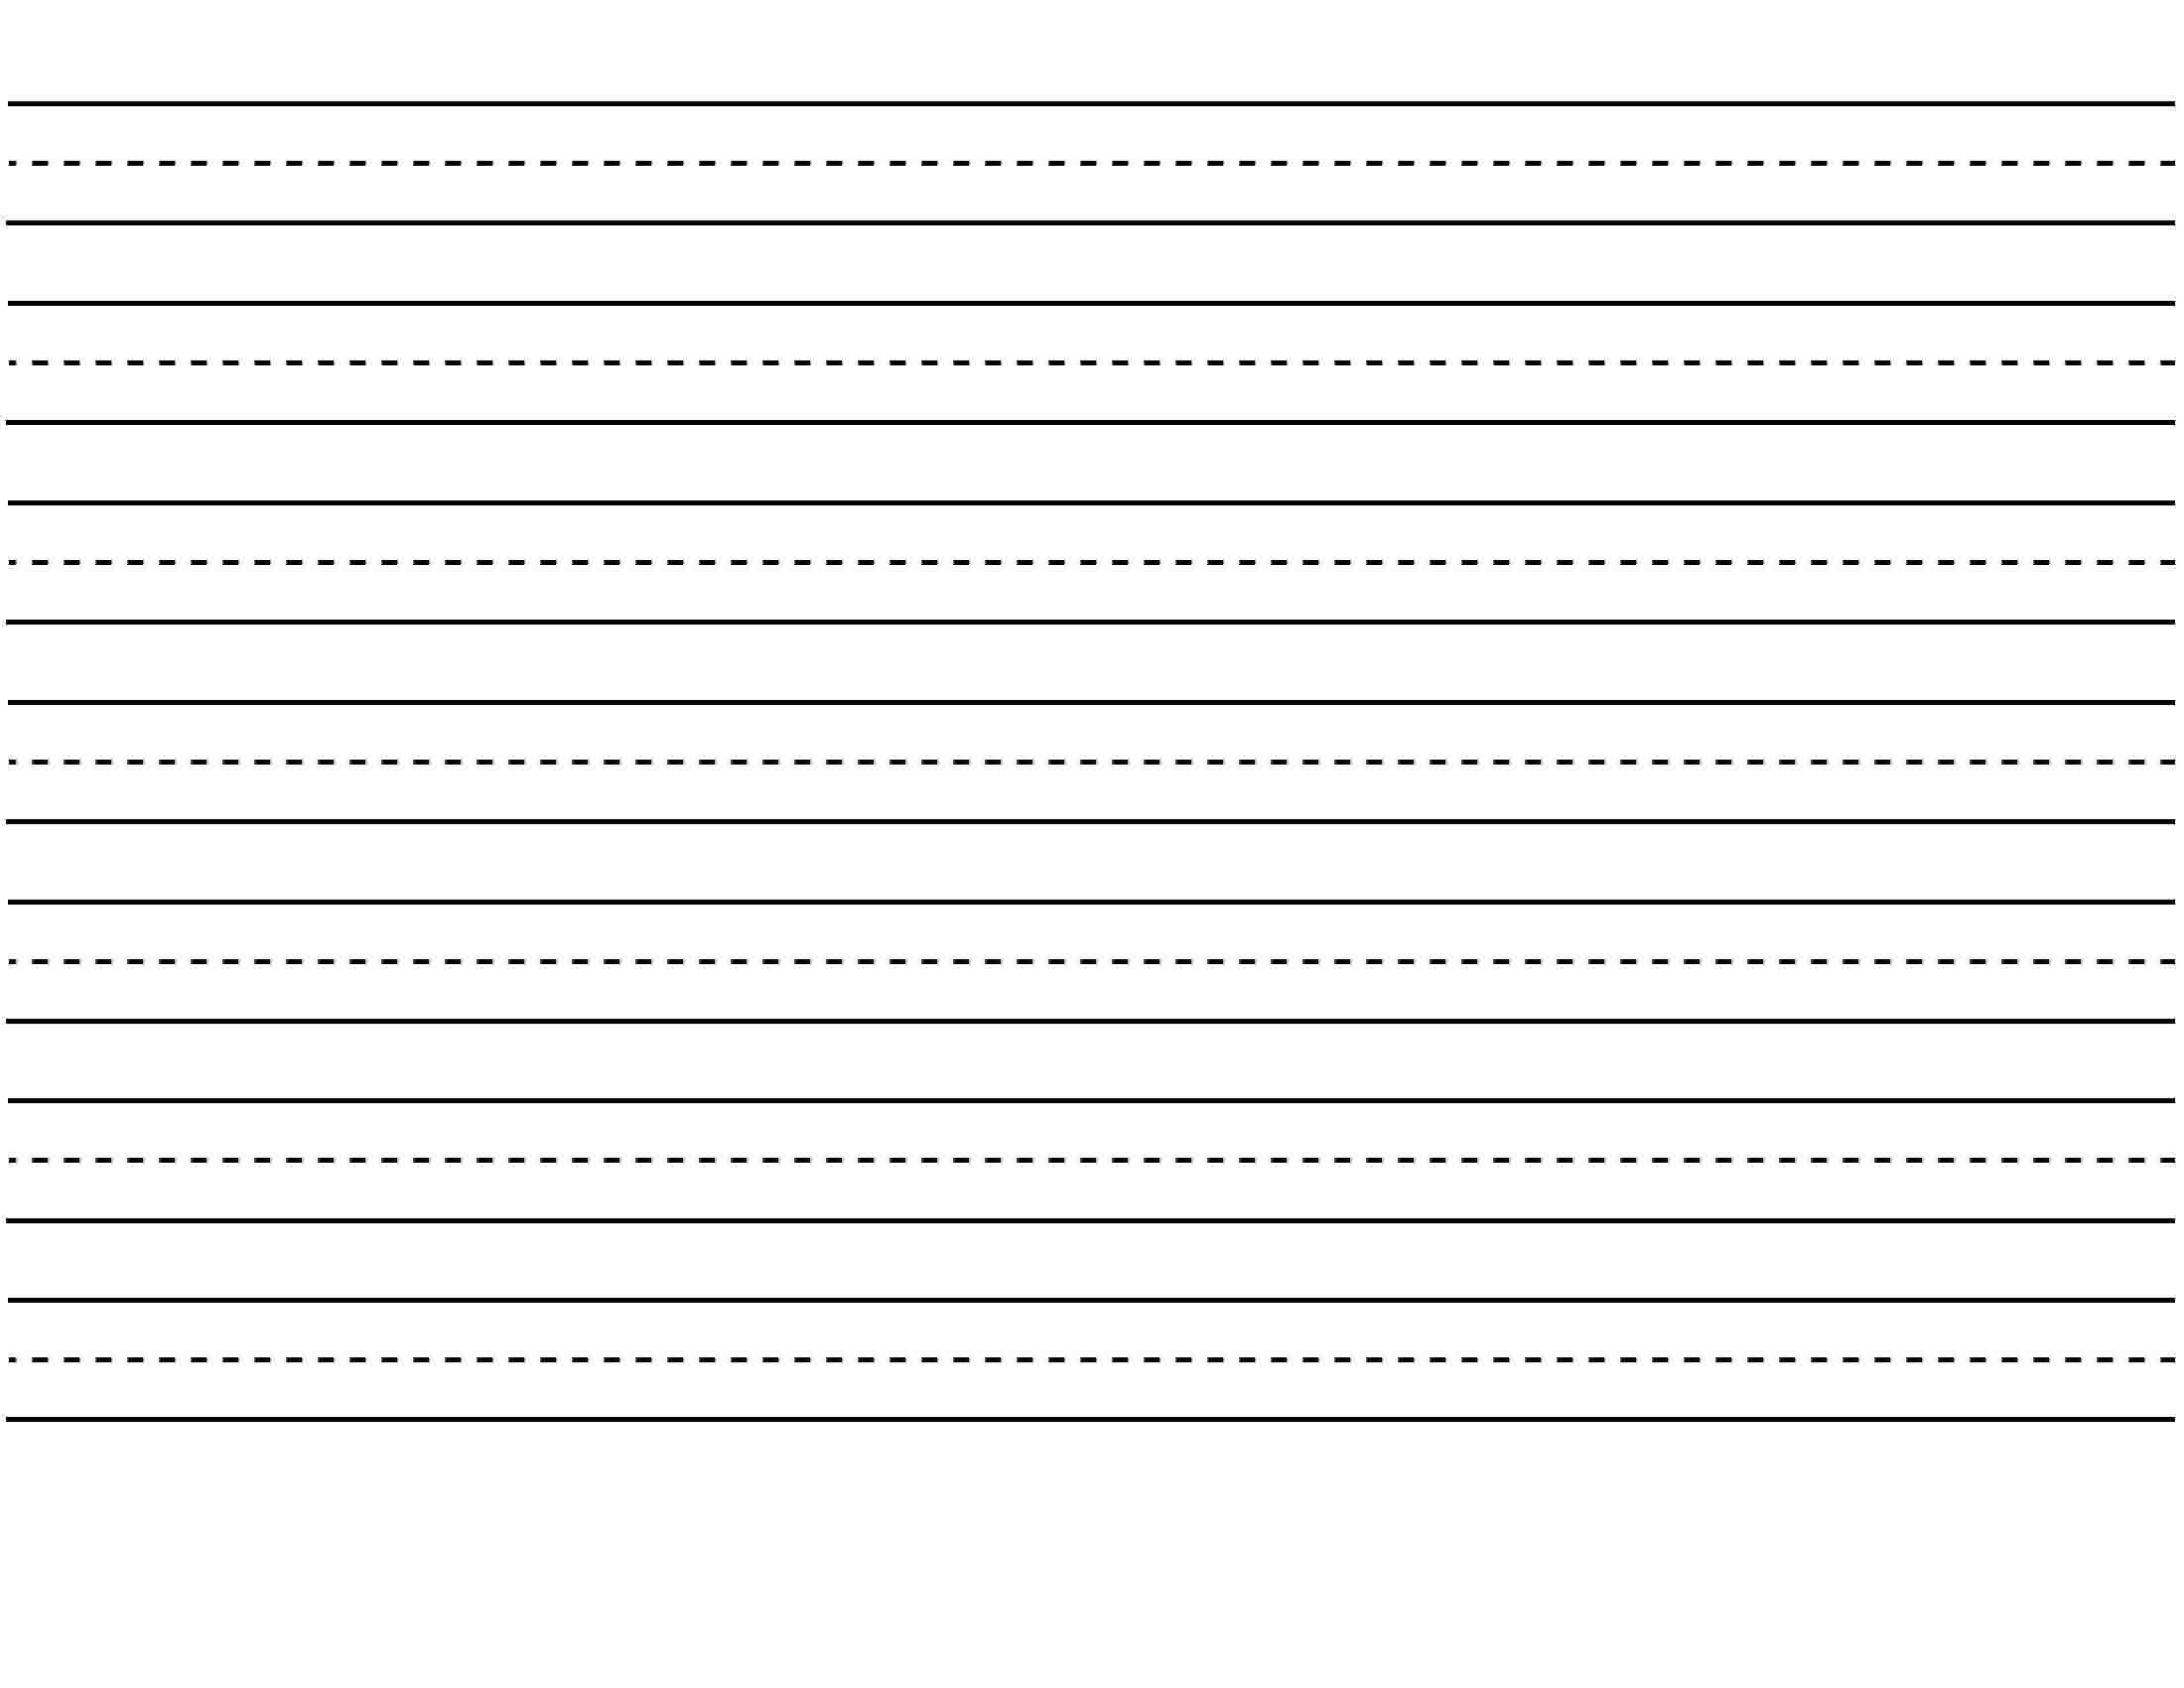 Blank Handwriting Paper Printable Free Lined Writing Template - Blank Handwriting Worksheets Printable Free